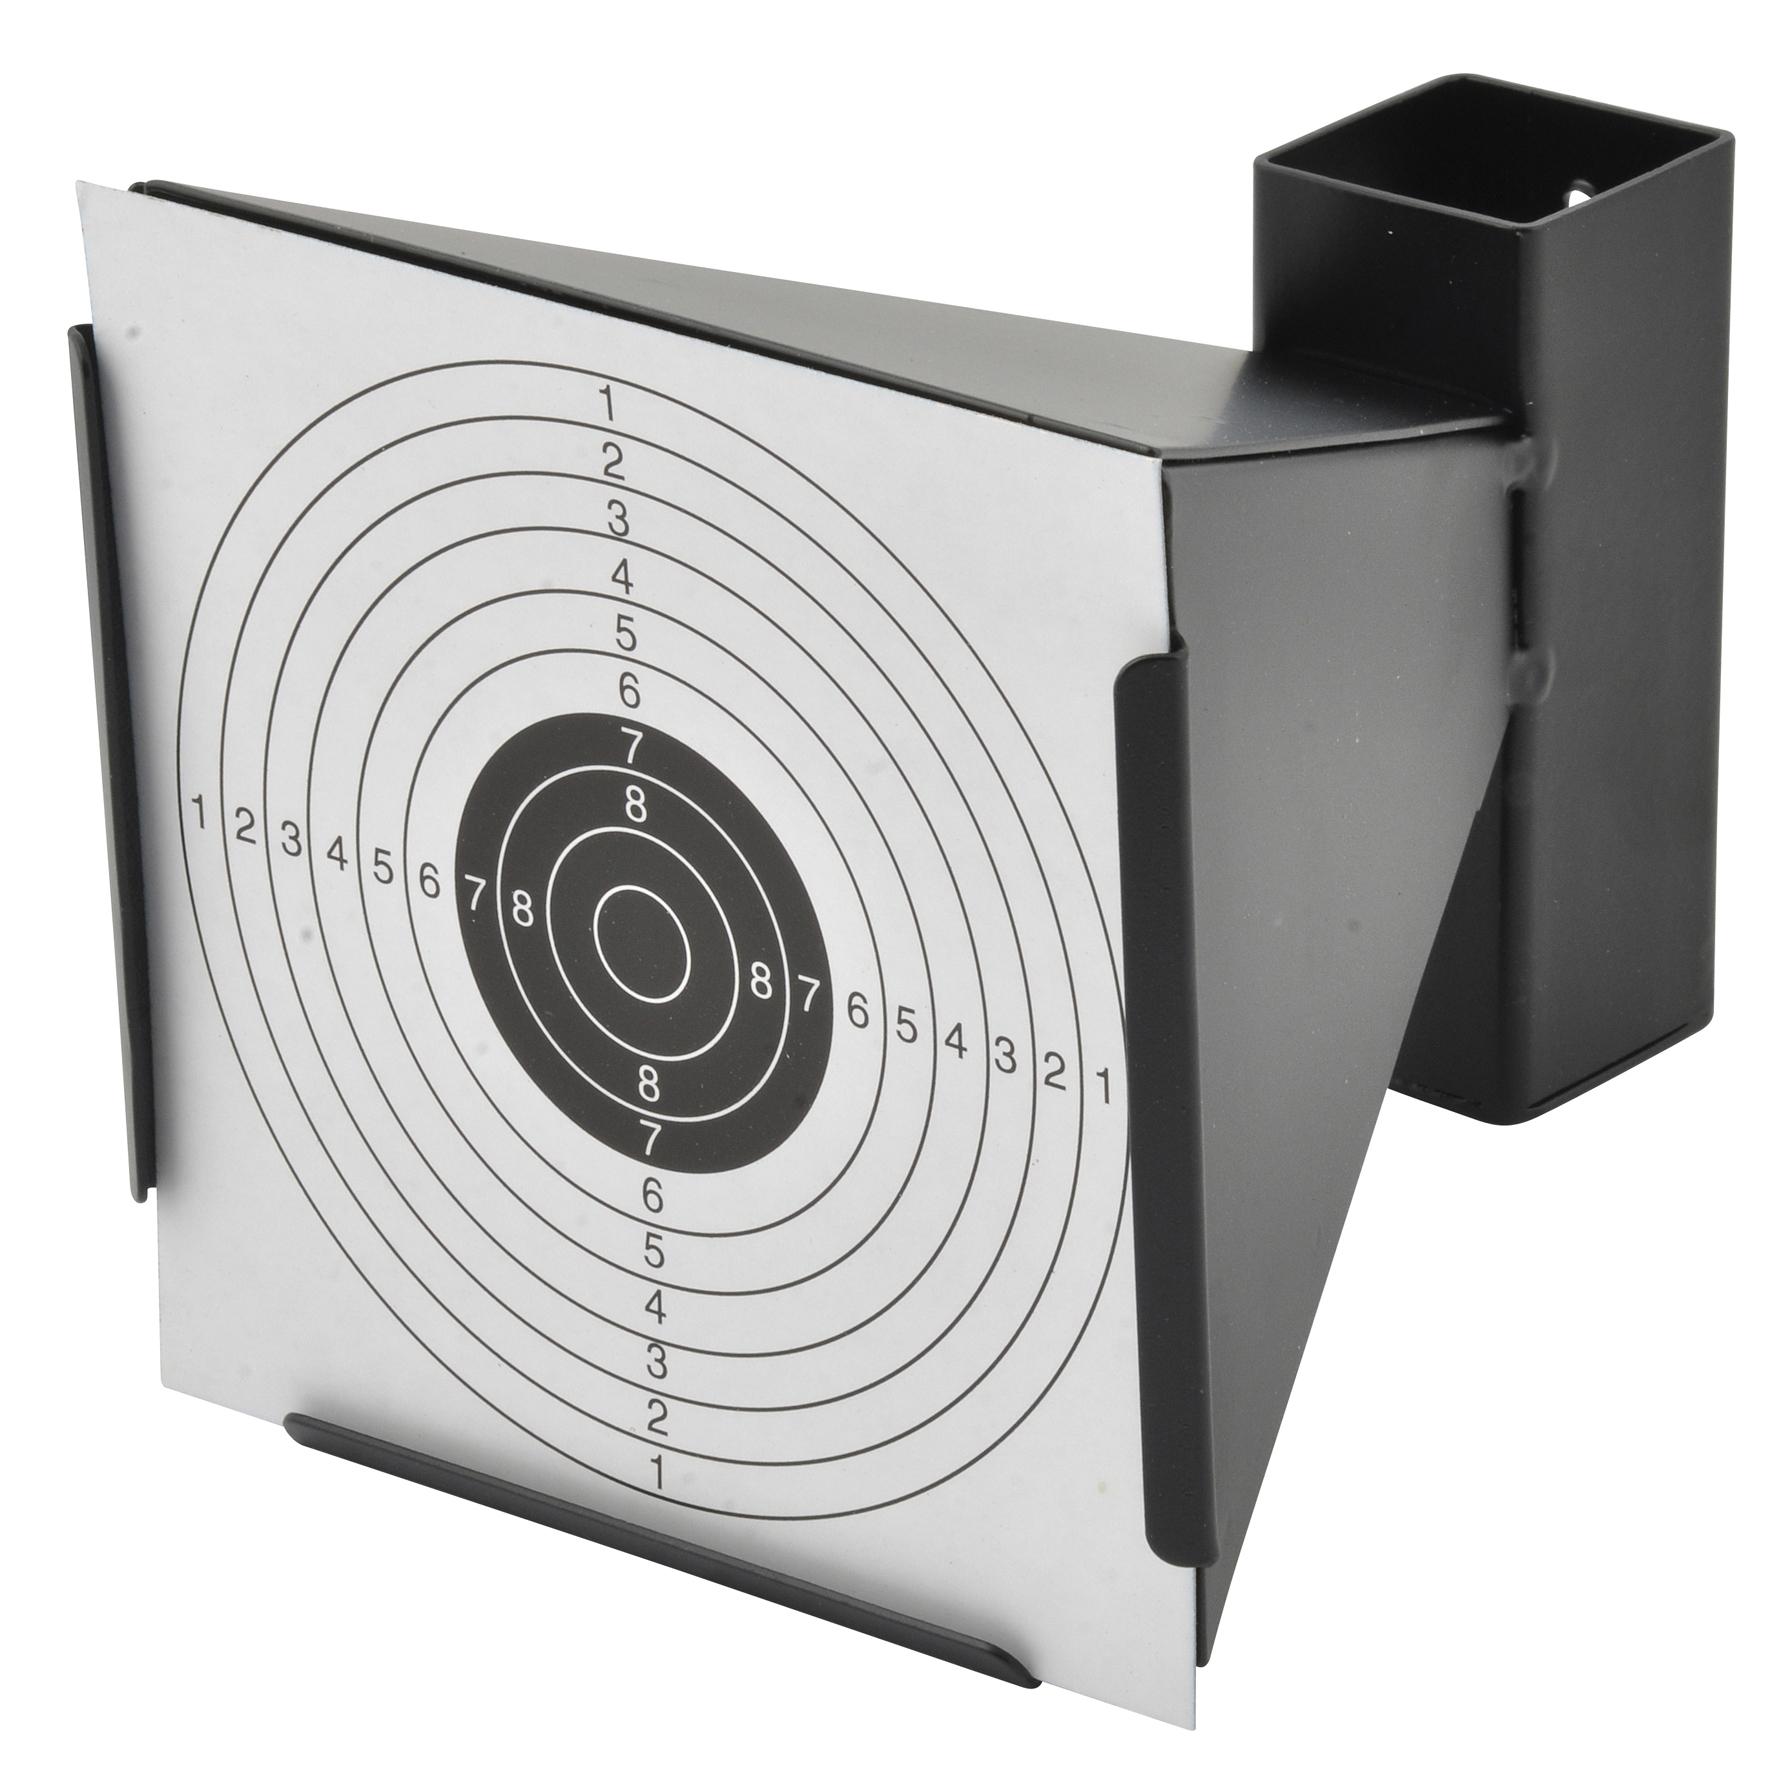 100 stk 14x14cm zielscheiben f r kugelfang luftgeweht luftpistole ziel ebay. Black Bedroom Furniture Sets. Home Design Ideas